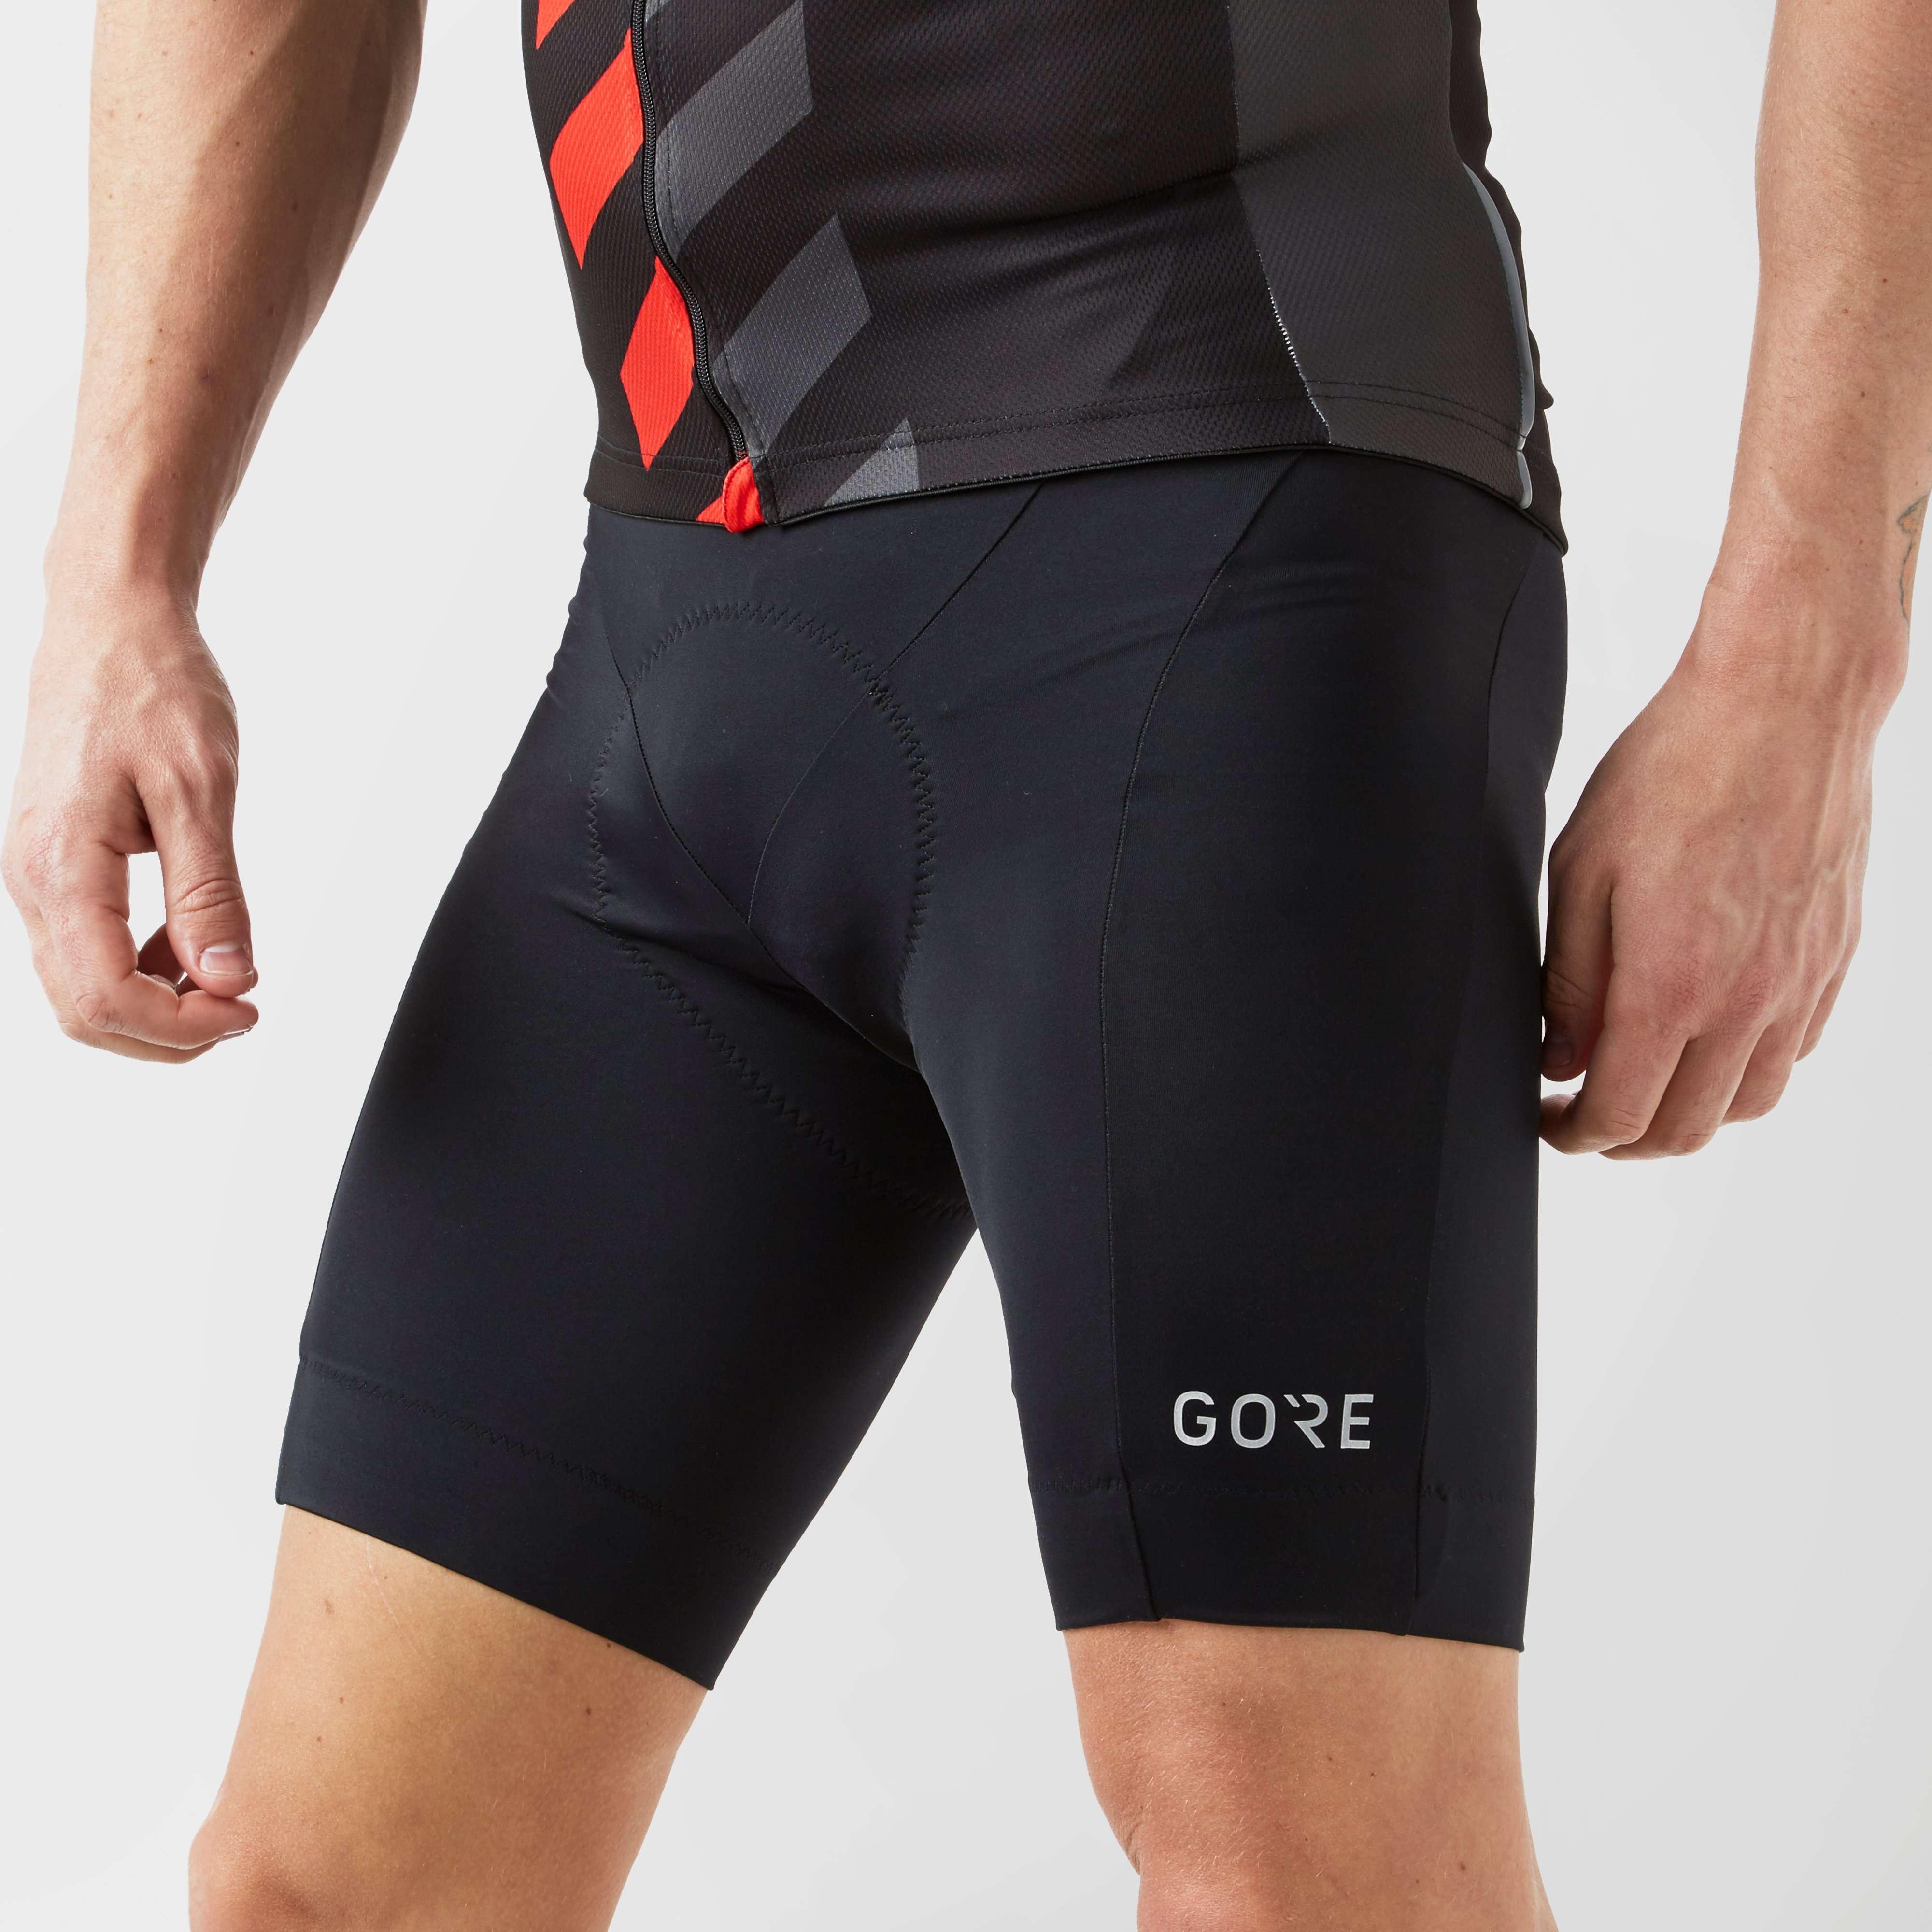 GORE Men's C3 Short Tights+